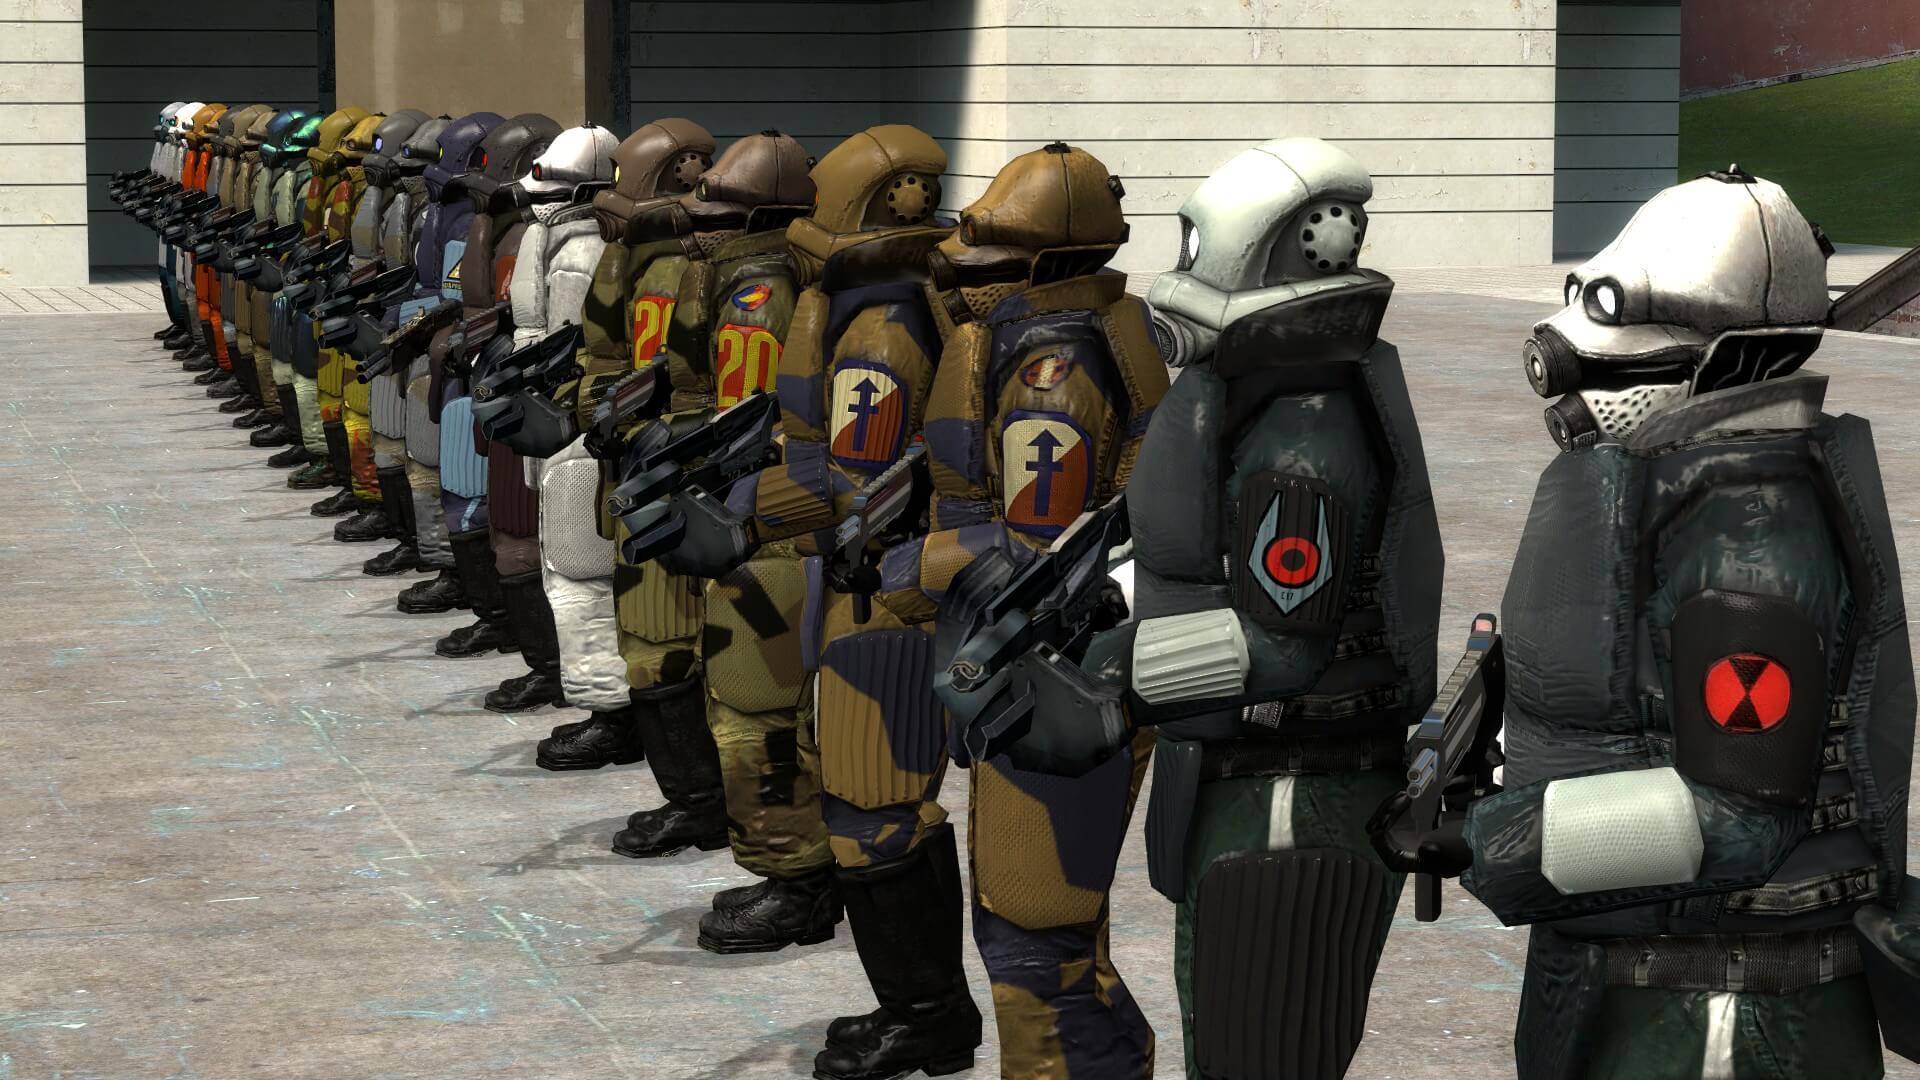 Garry's Mod - Combine Armored PMs and NPCs II